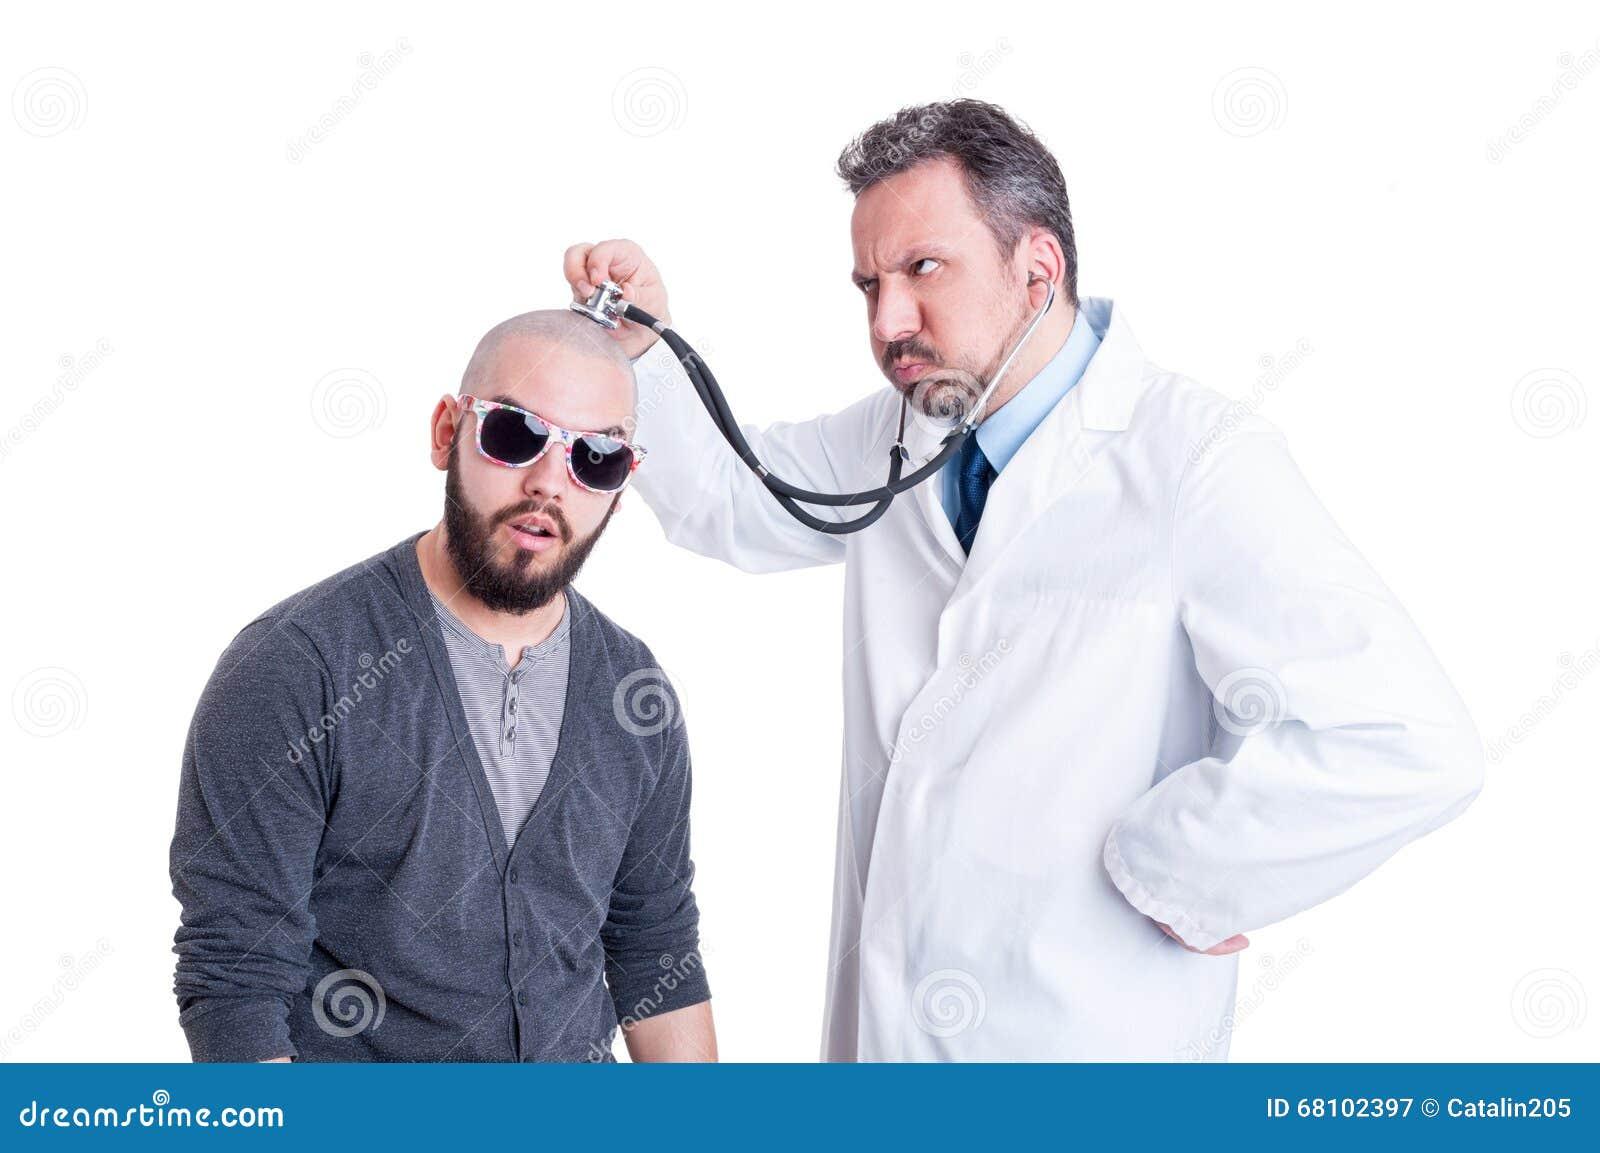 picture gay man receiving a facial